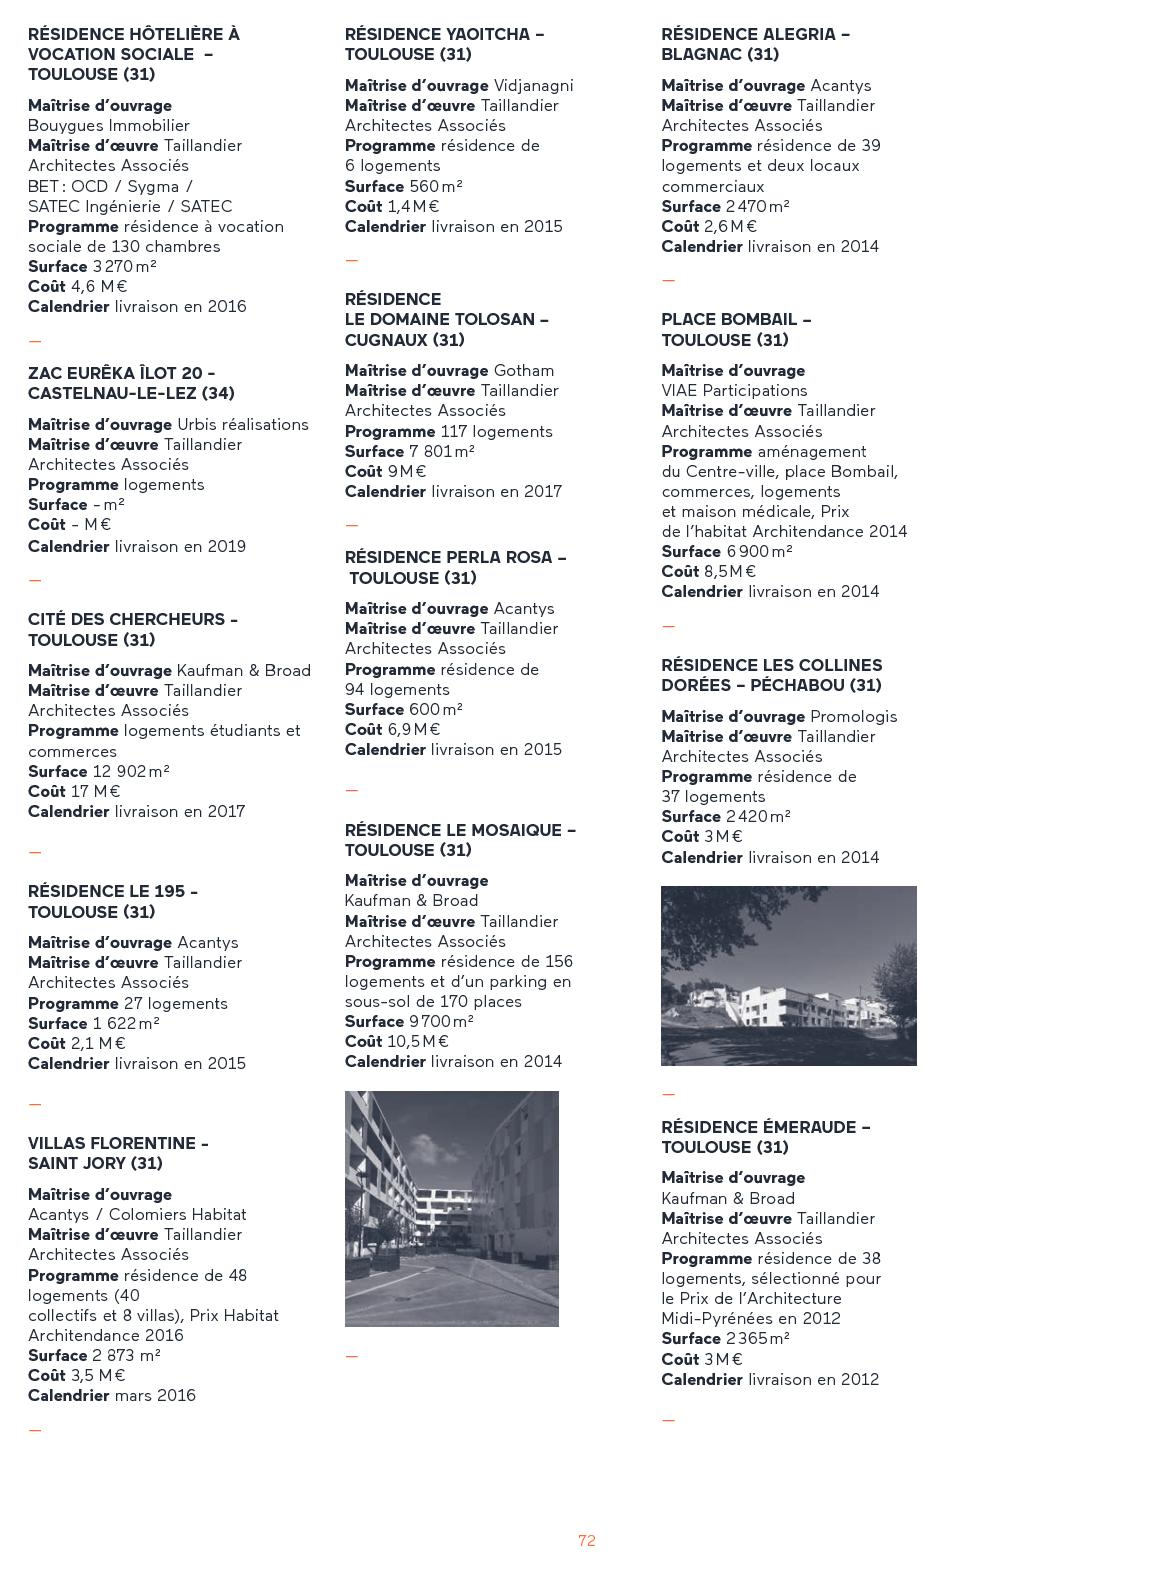 Calendrier Gotham.Portfolio 3 Taillandier Architectes Associes Calameo